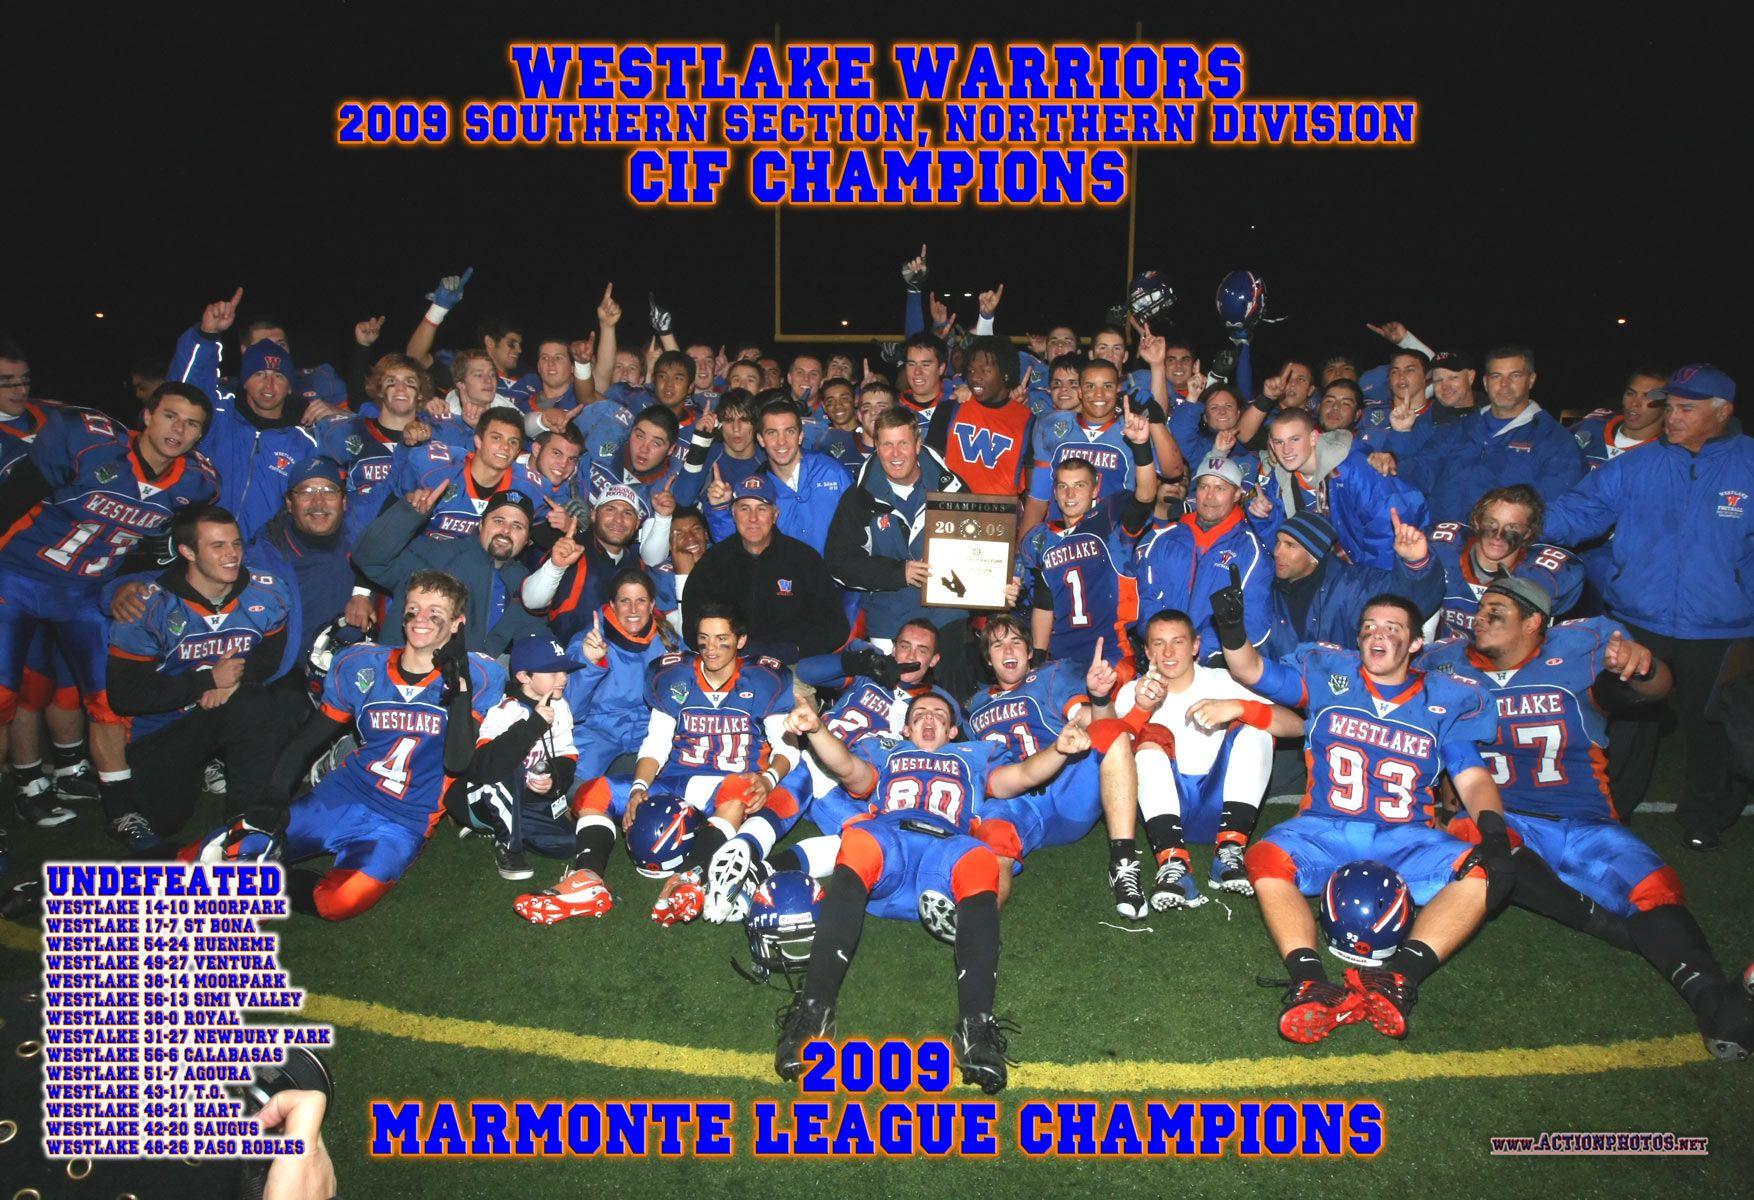 1r2009_cif_champions_westlake.jpg